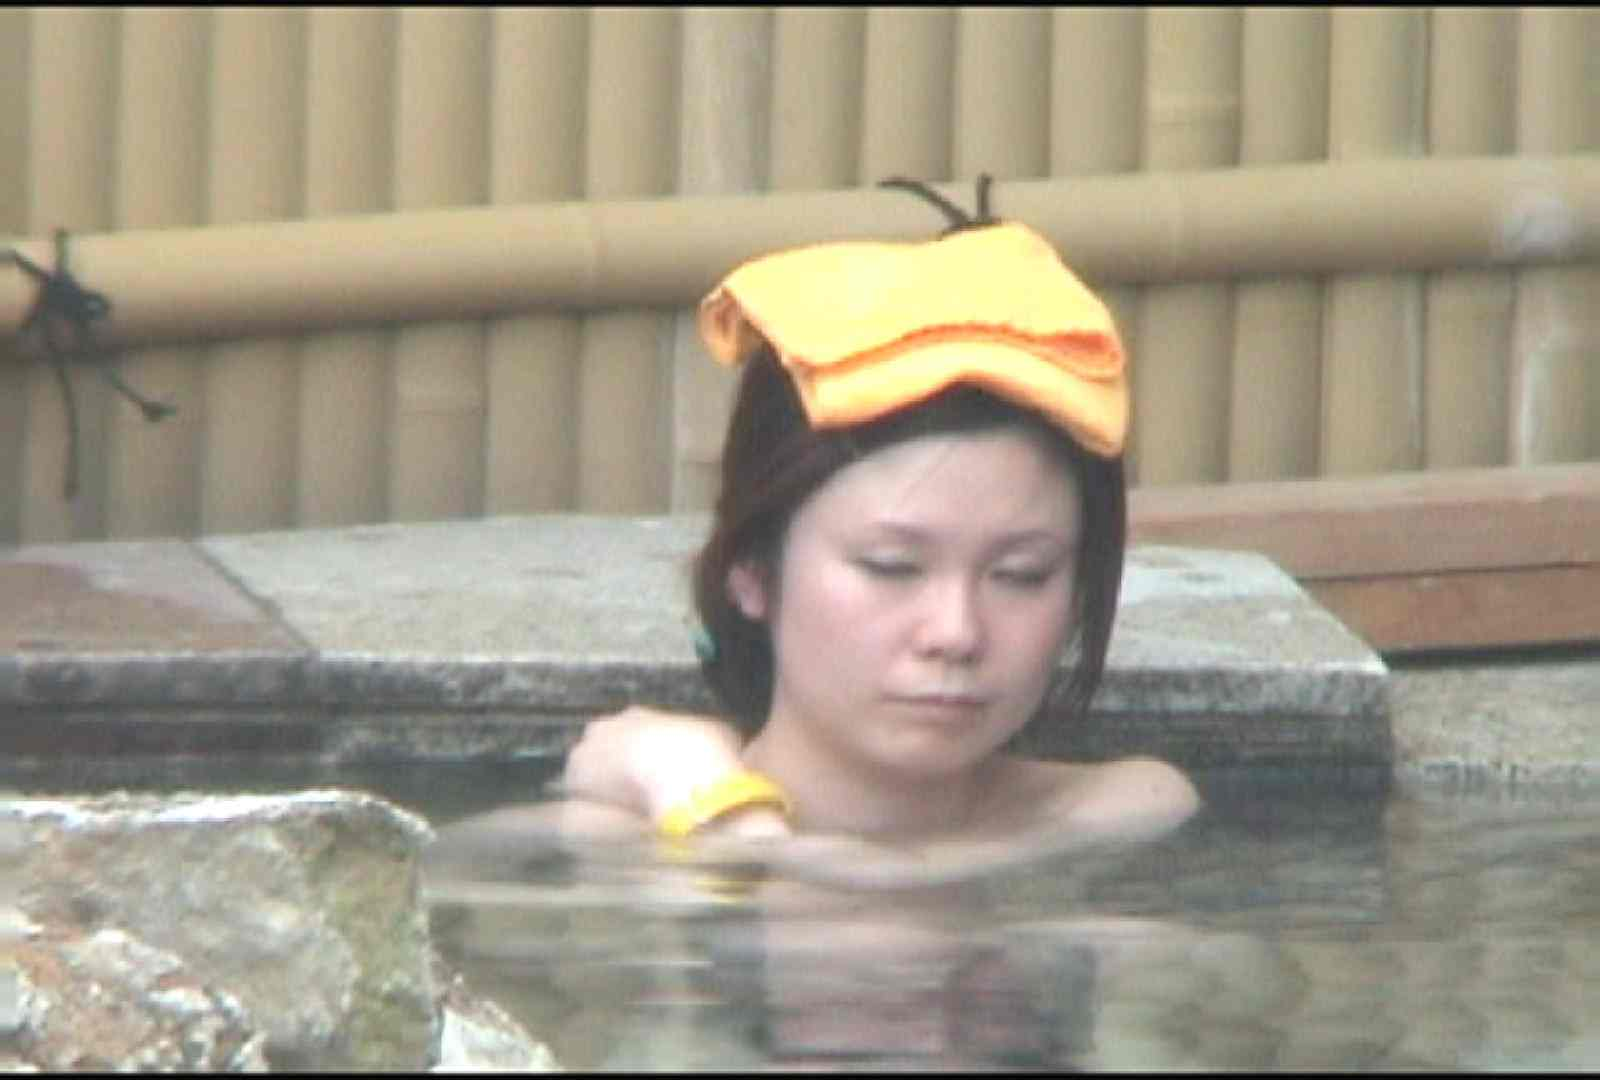 Aquaな露天風呂Vol.177 綺麗なOLたち アダルト動画キャプチャ 112枚 11